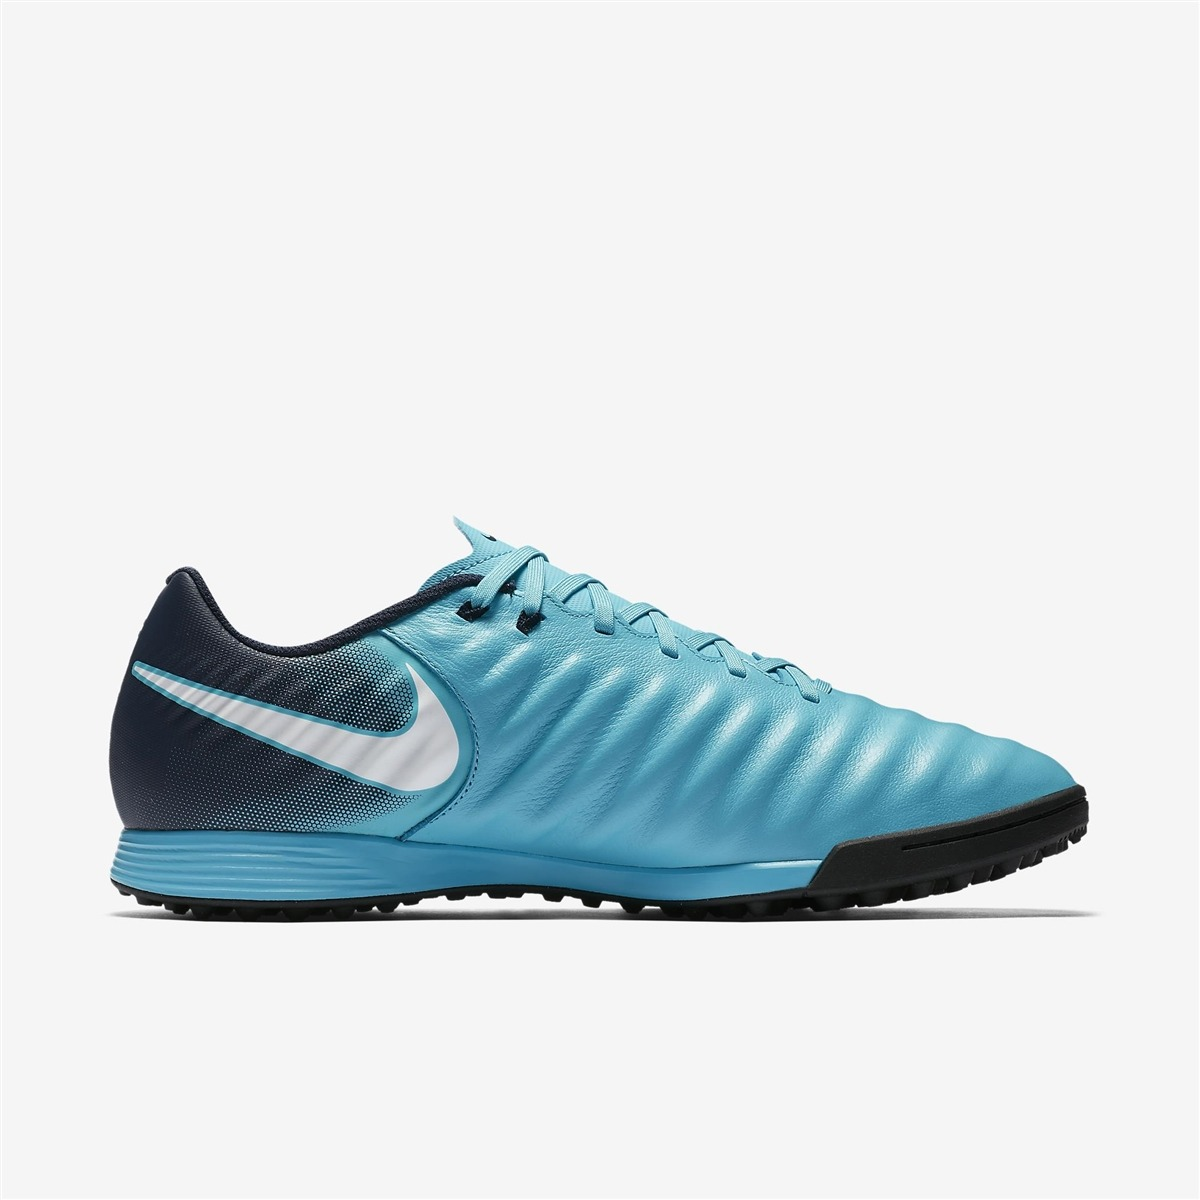 73ed76a220 Chuteira Society Nike Tiempo X Ligera 4 Tf Couro Original Nf - R ...